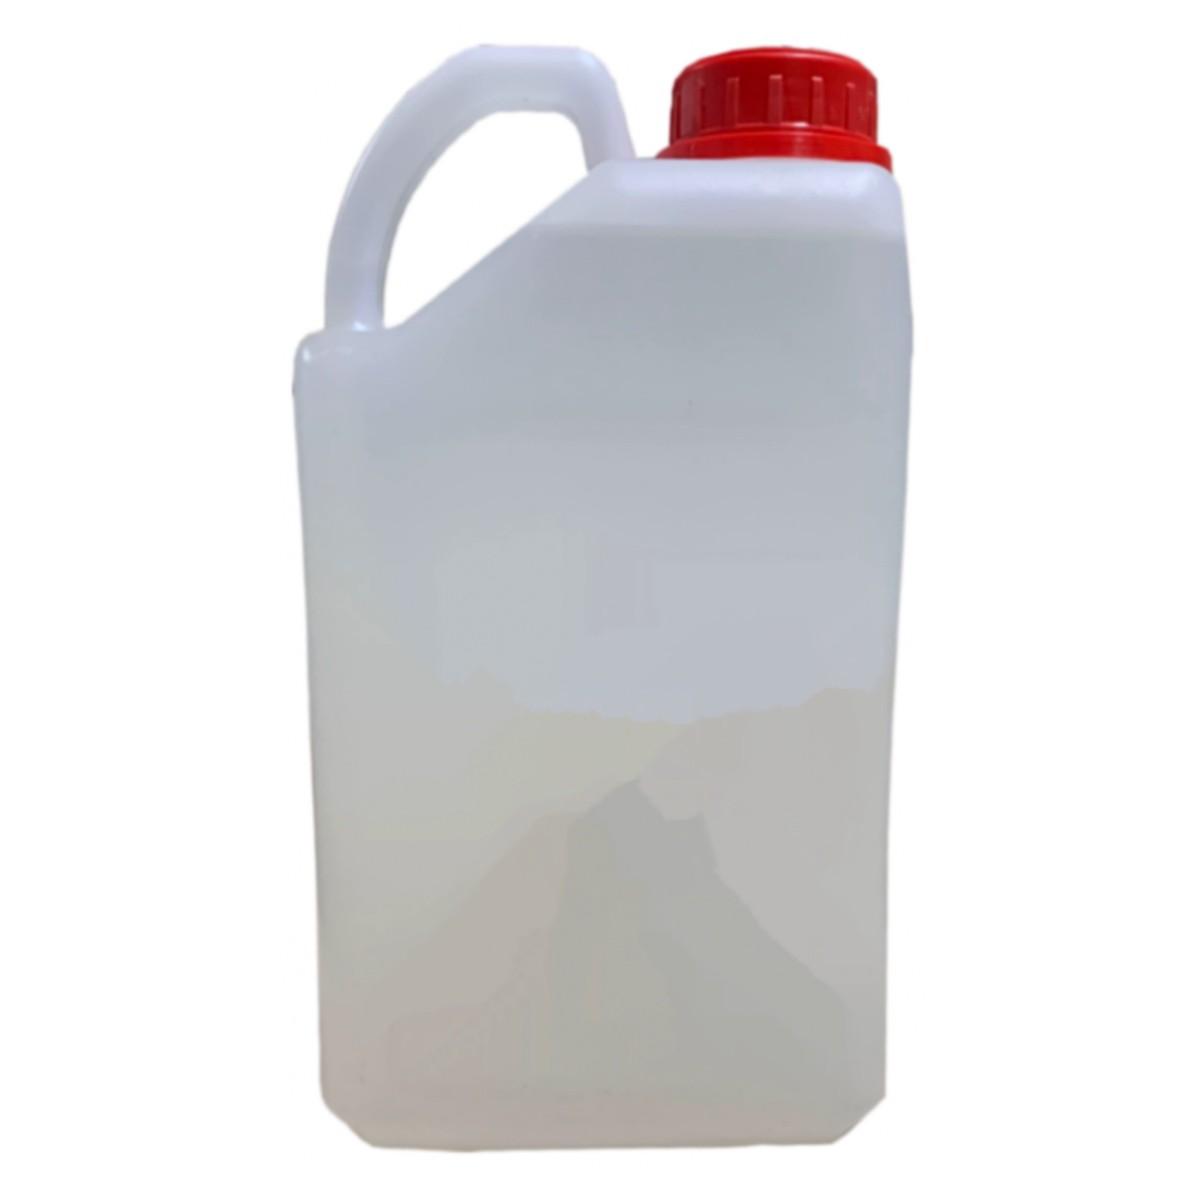 Álcool Líquido 70° Bautech 3,6l